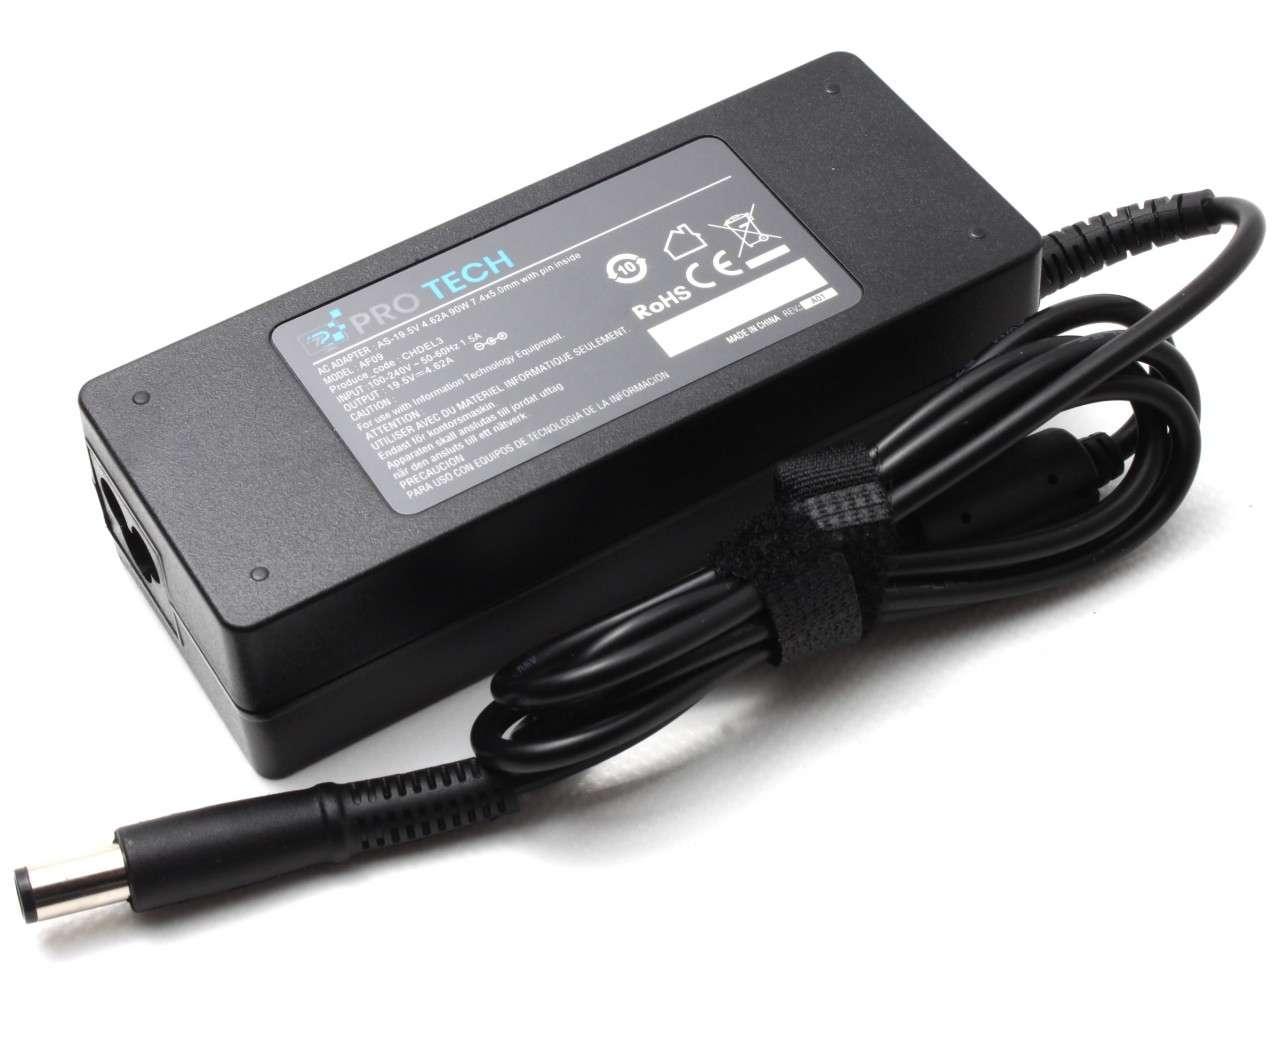 Incarcator Dell Inspiron 8600c Replacement imagine powerlaptop.ro 2021